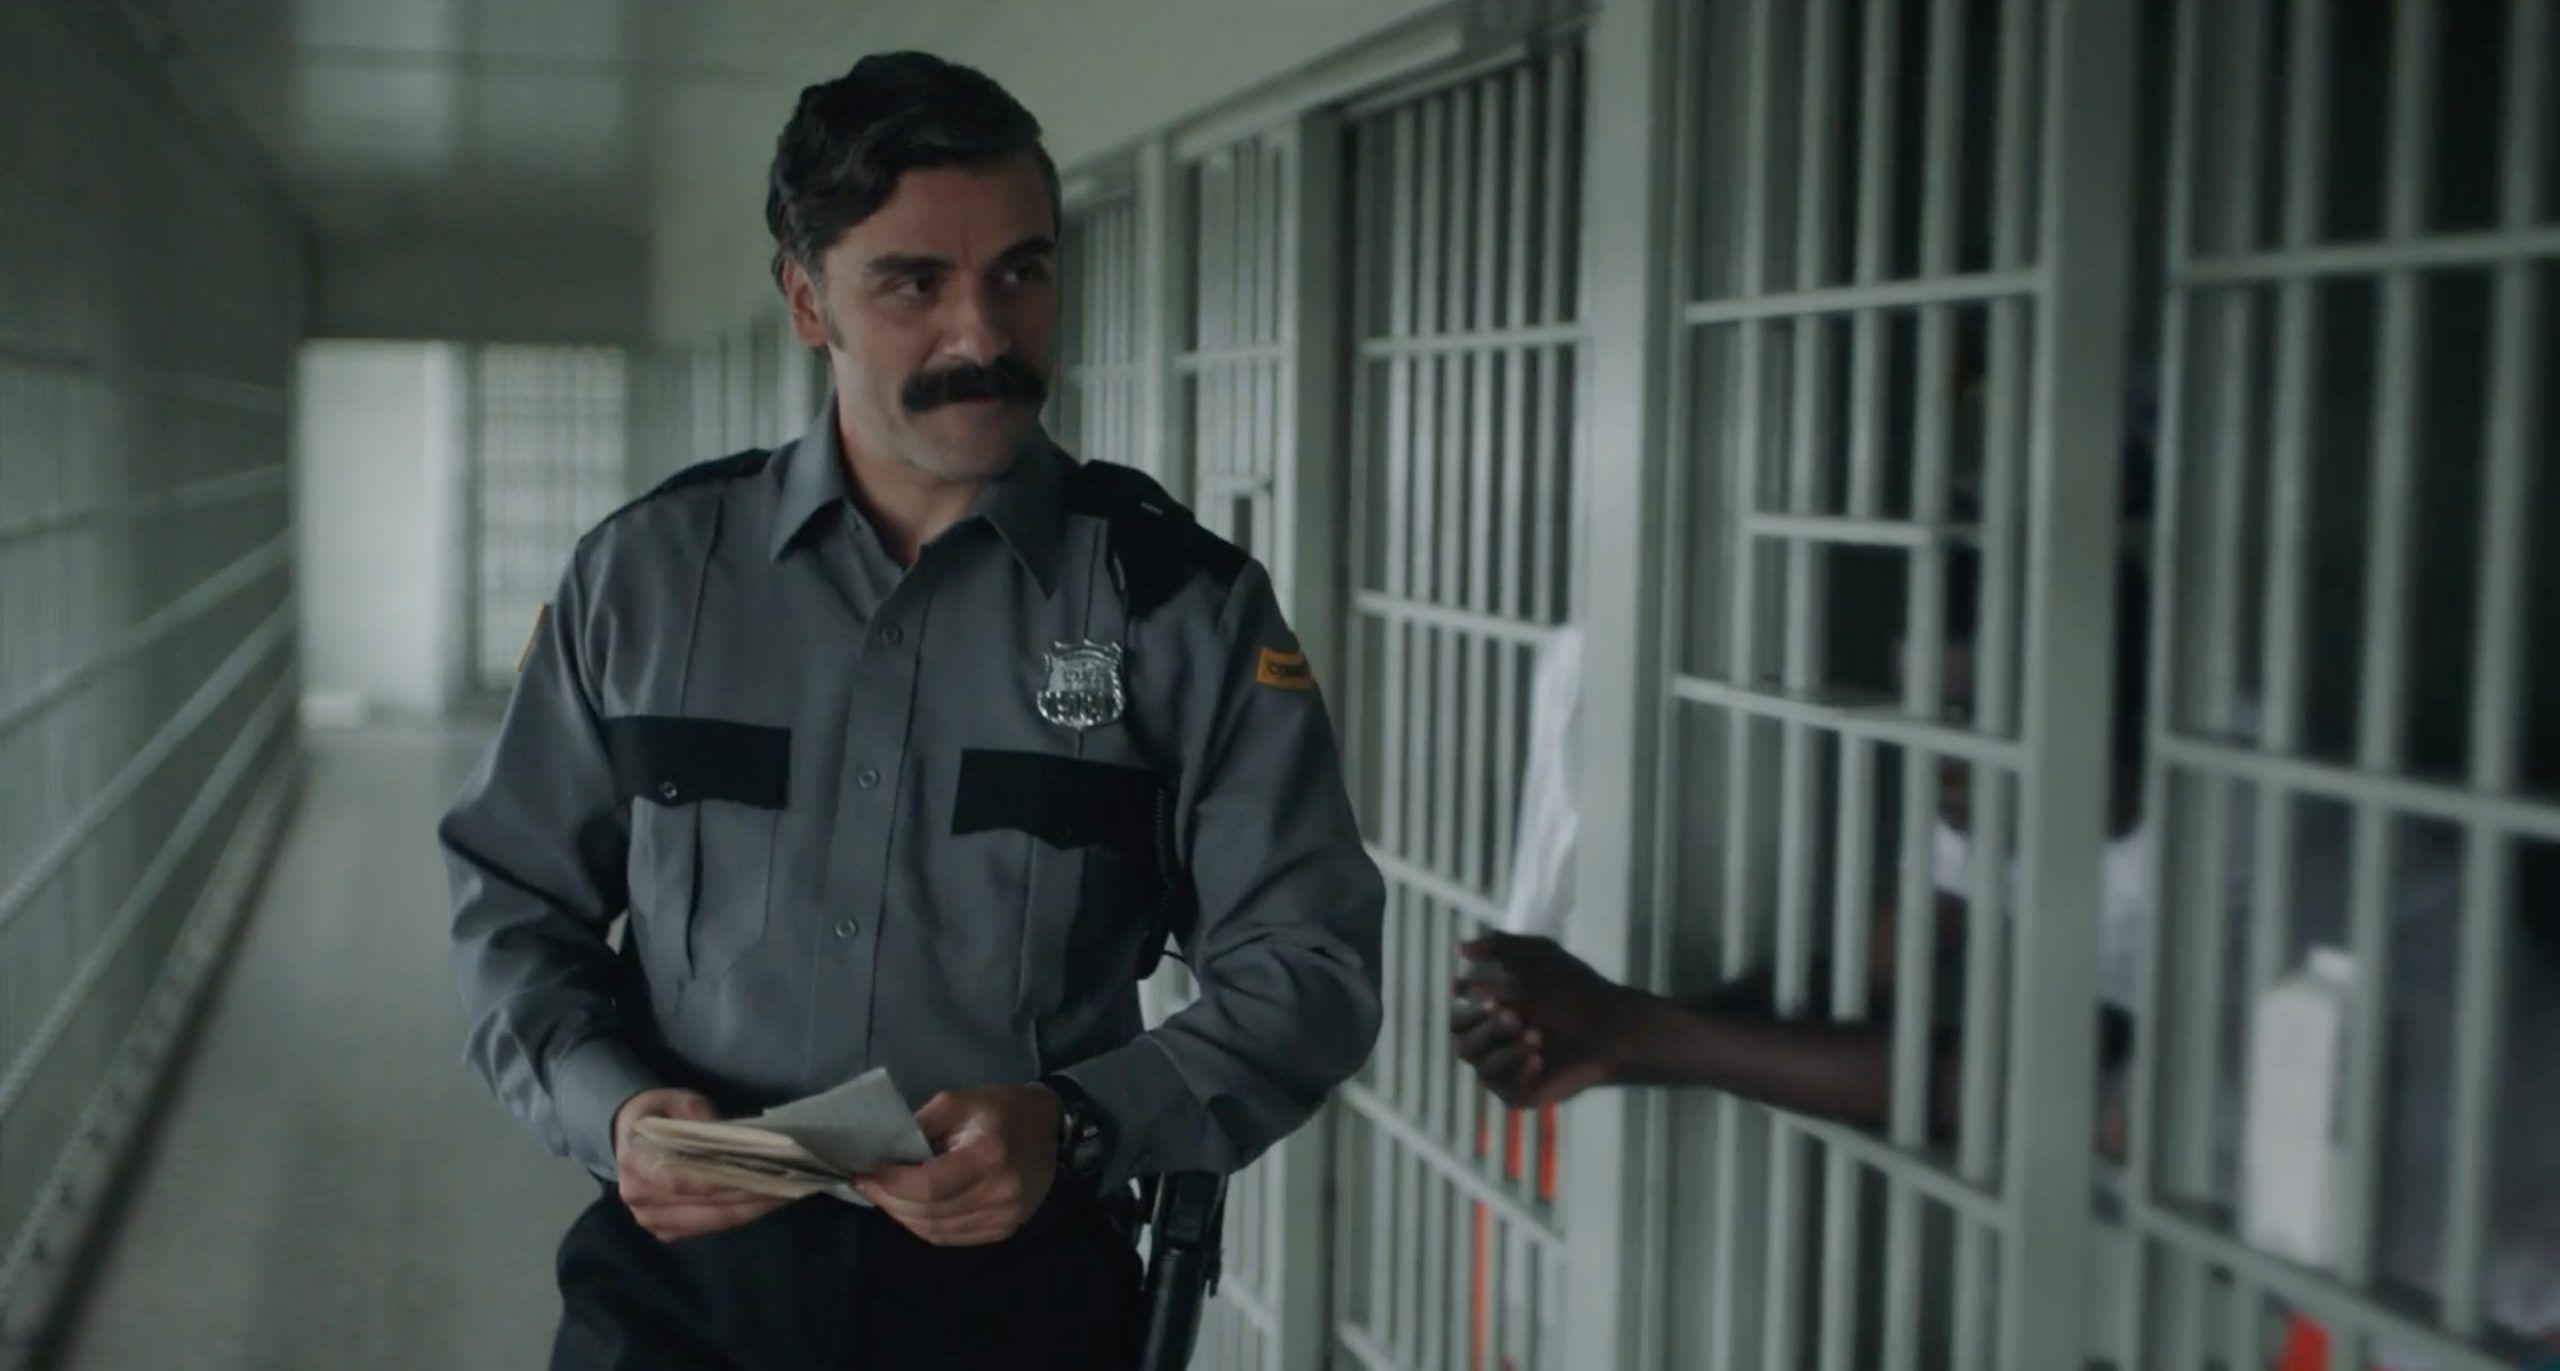 Oscar Isaac en The Letter Room 2021 - Filmfilicos blog de cine